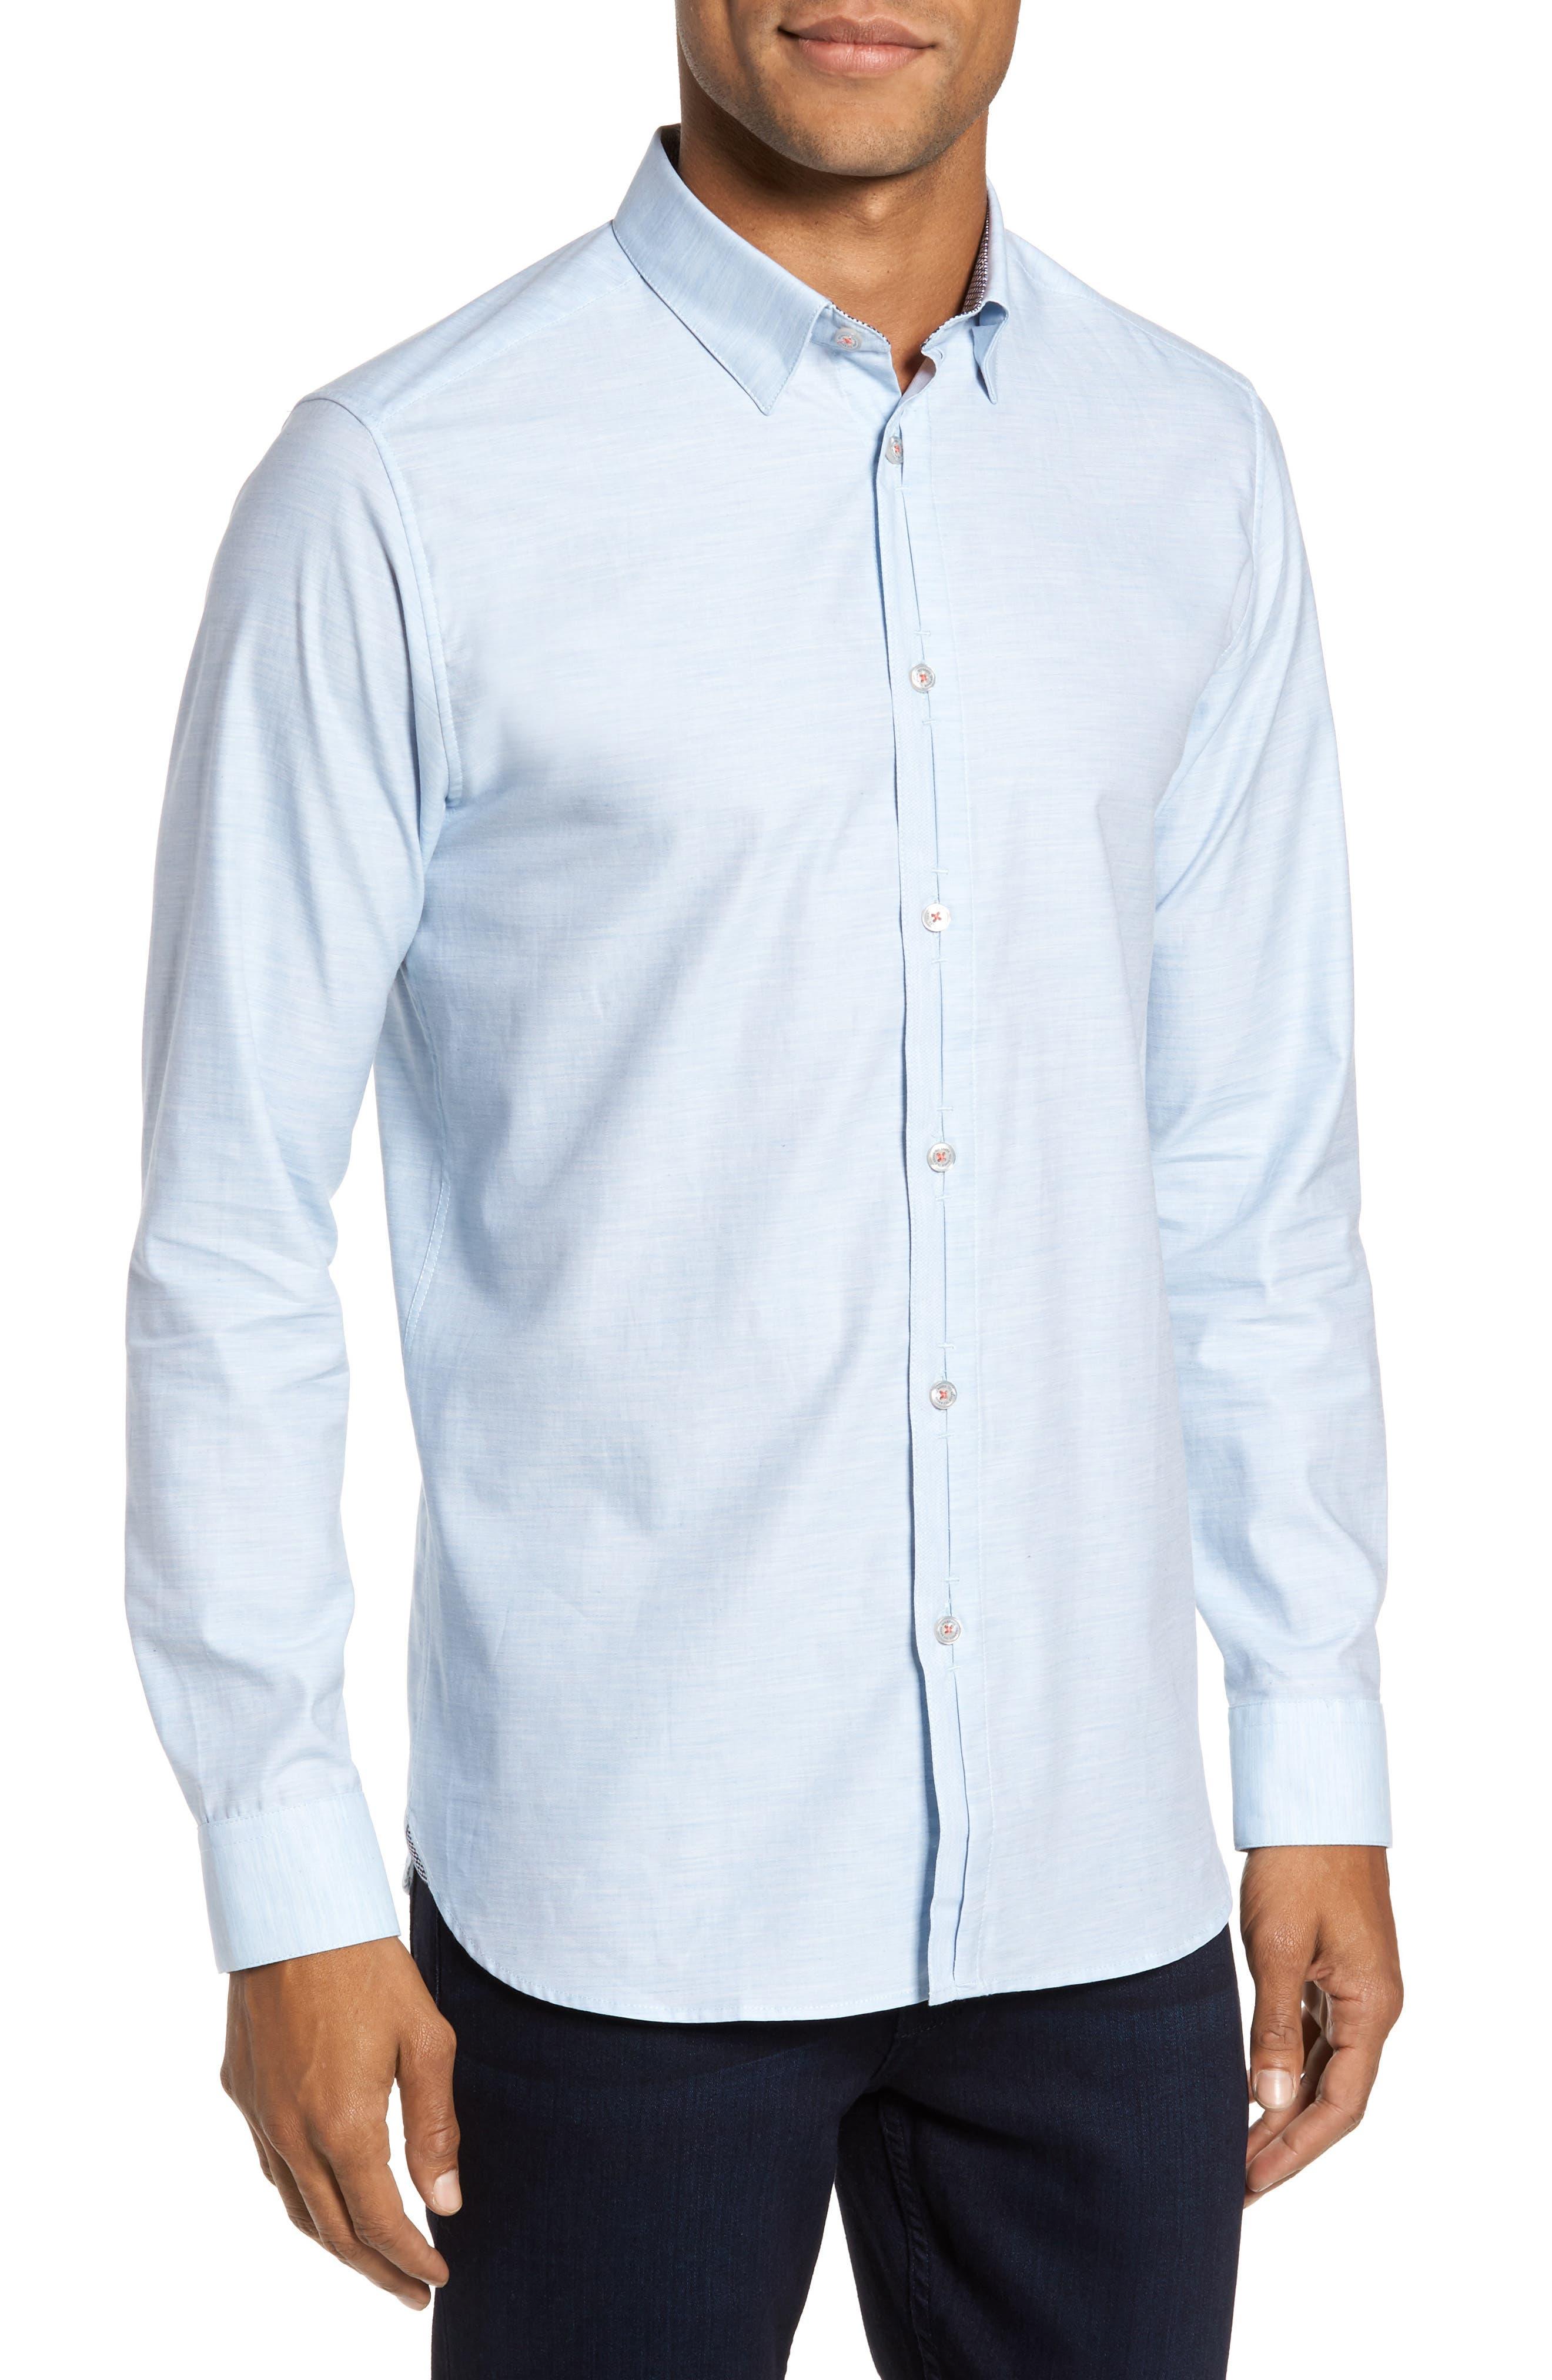 Main Image - Ted Baker London Annisley Modern Slim Fit Sport Shirt